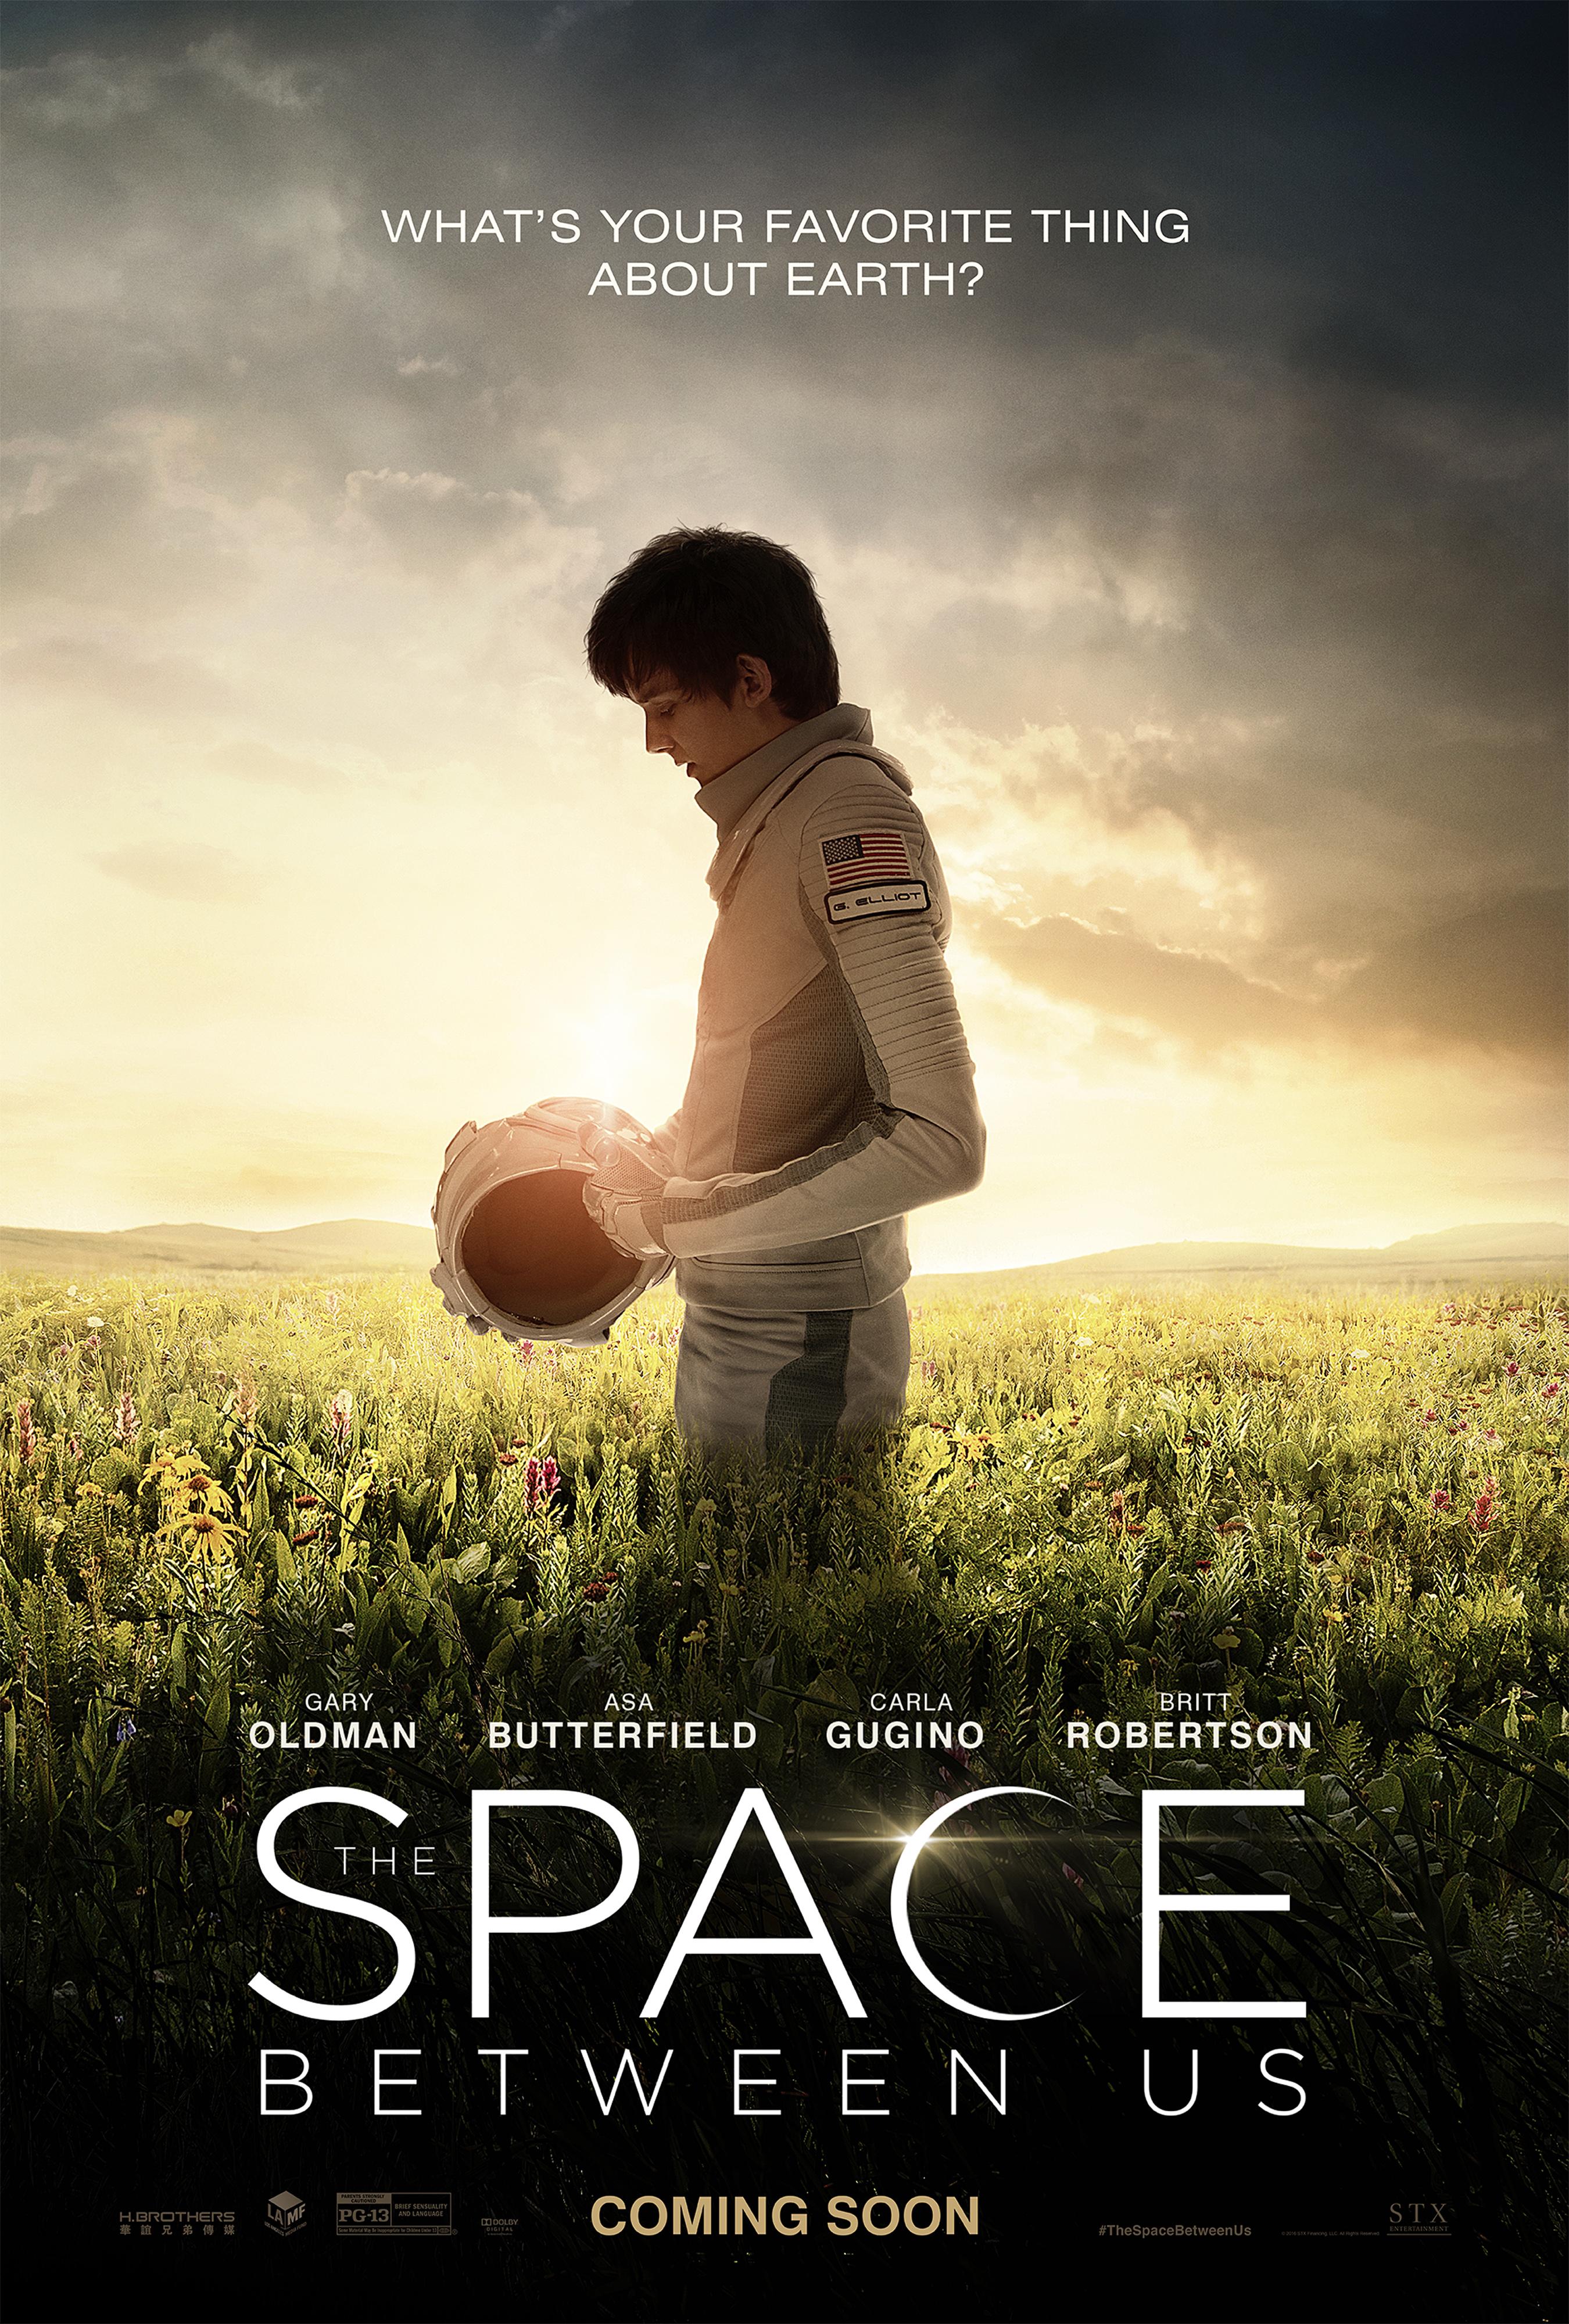 The Space Between Us (2017) The-space-between-us-732496l